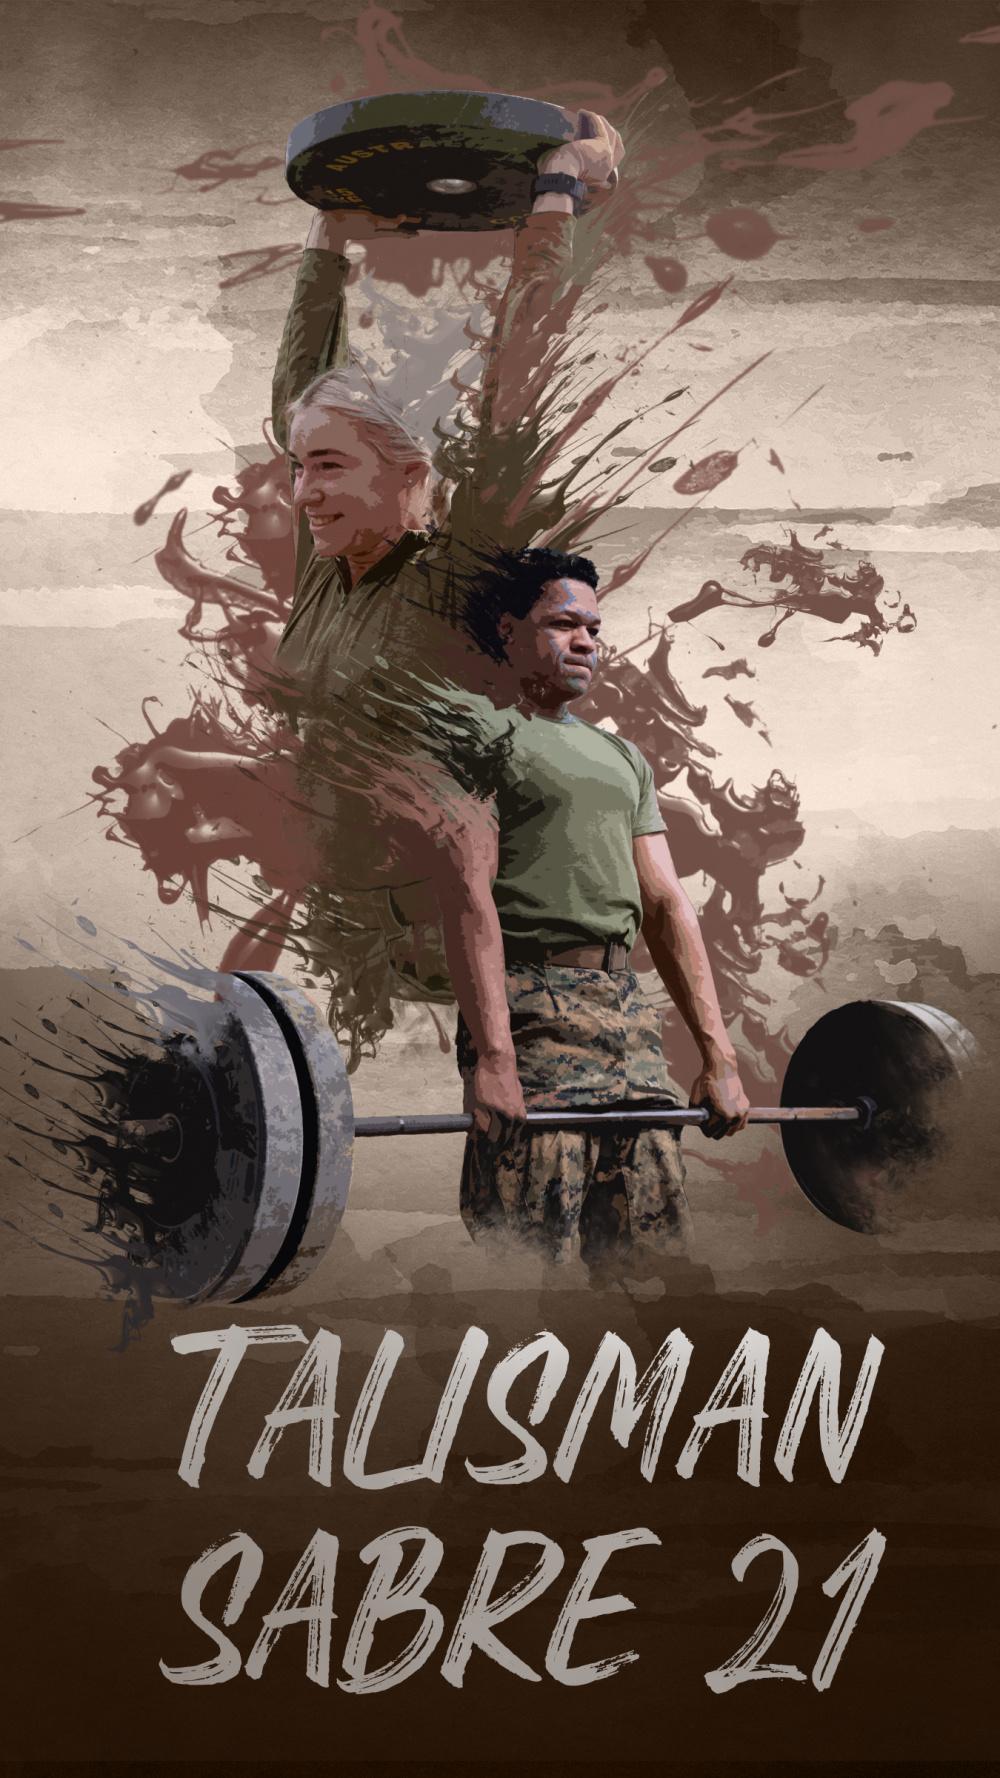 Talisman Sabre 21 Poster